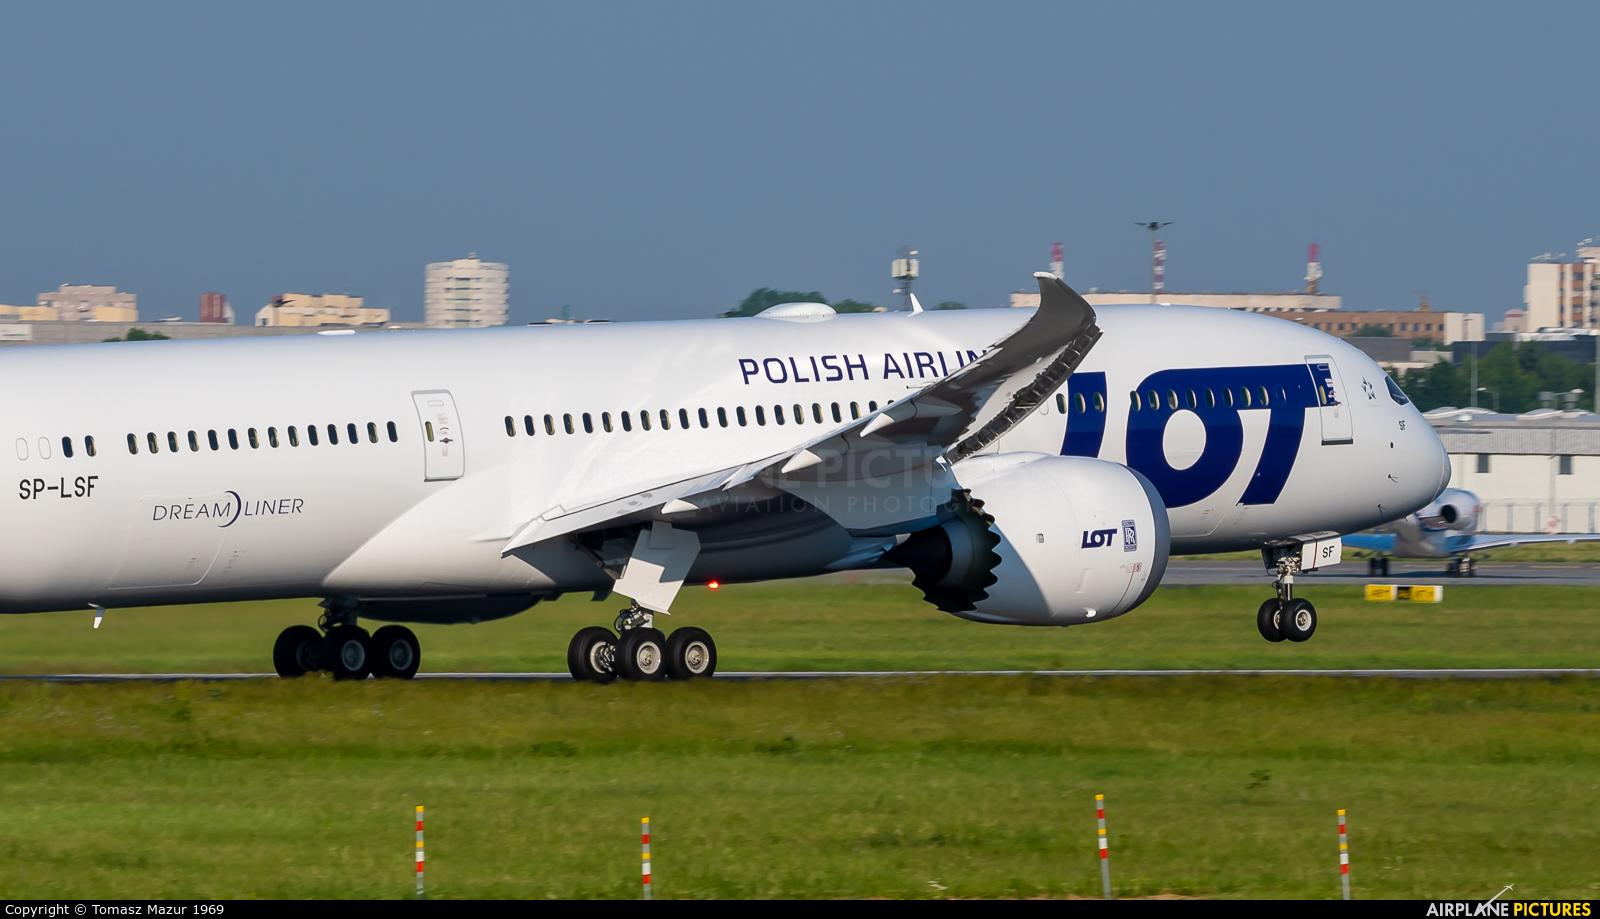 LOT - Polish Airlines SP-LSF aircraft at Warsaw - Frederic Chopin